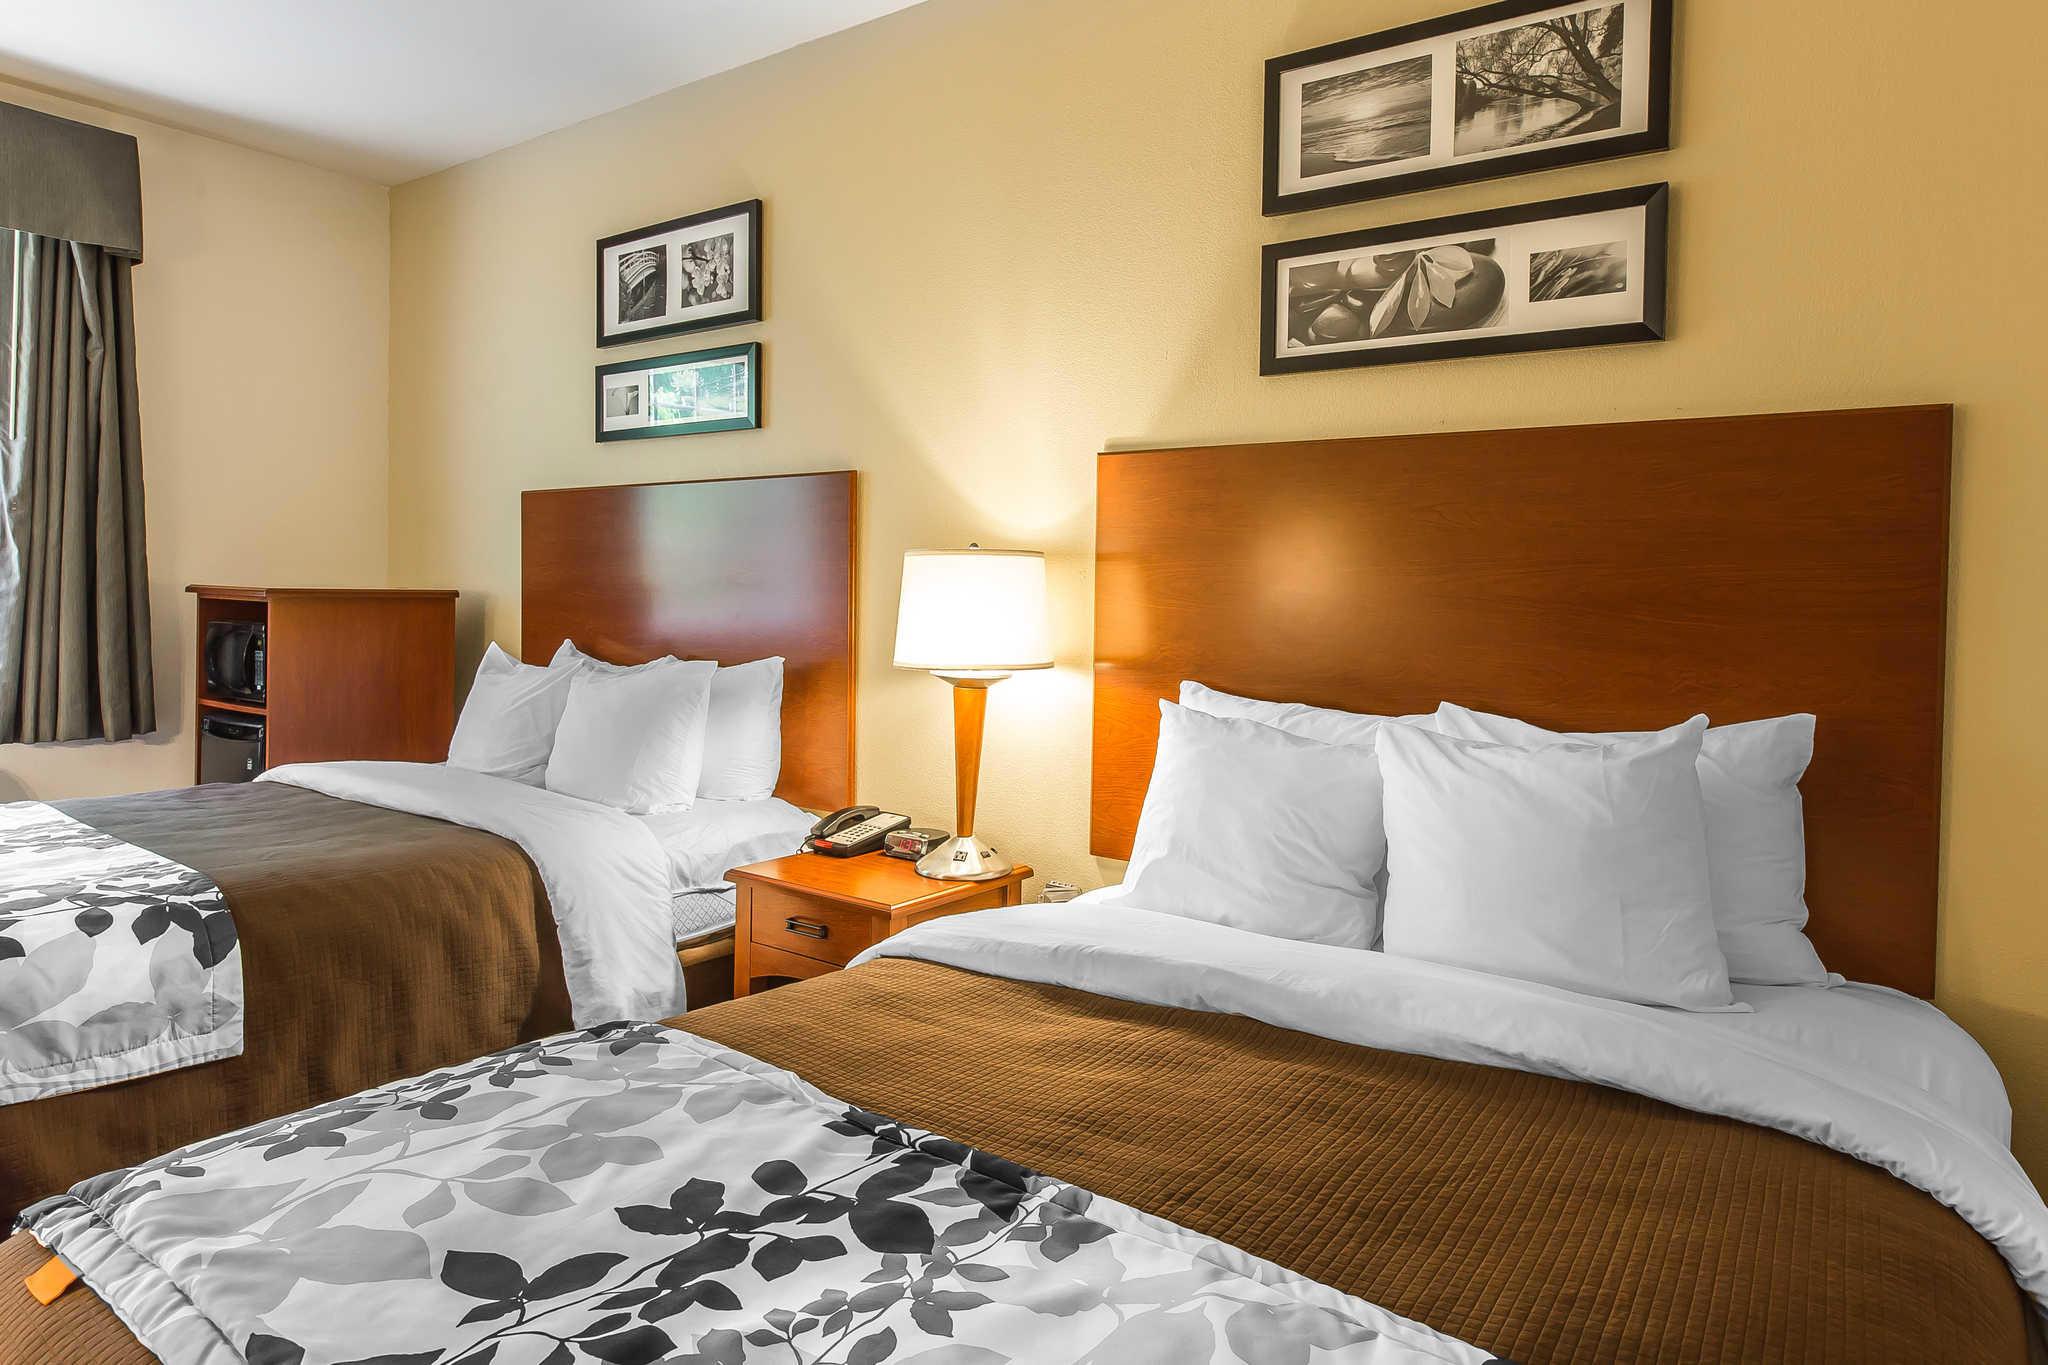 Sleep Inn & Suites At Kennesaw State University image 13